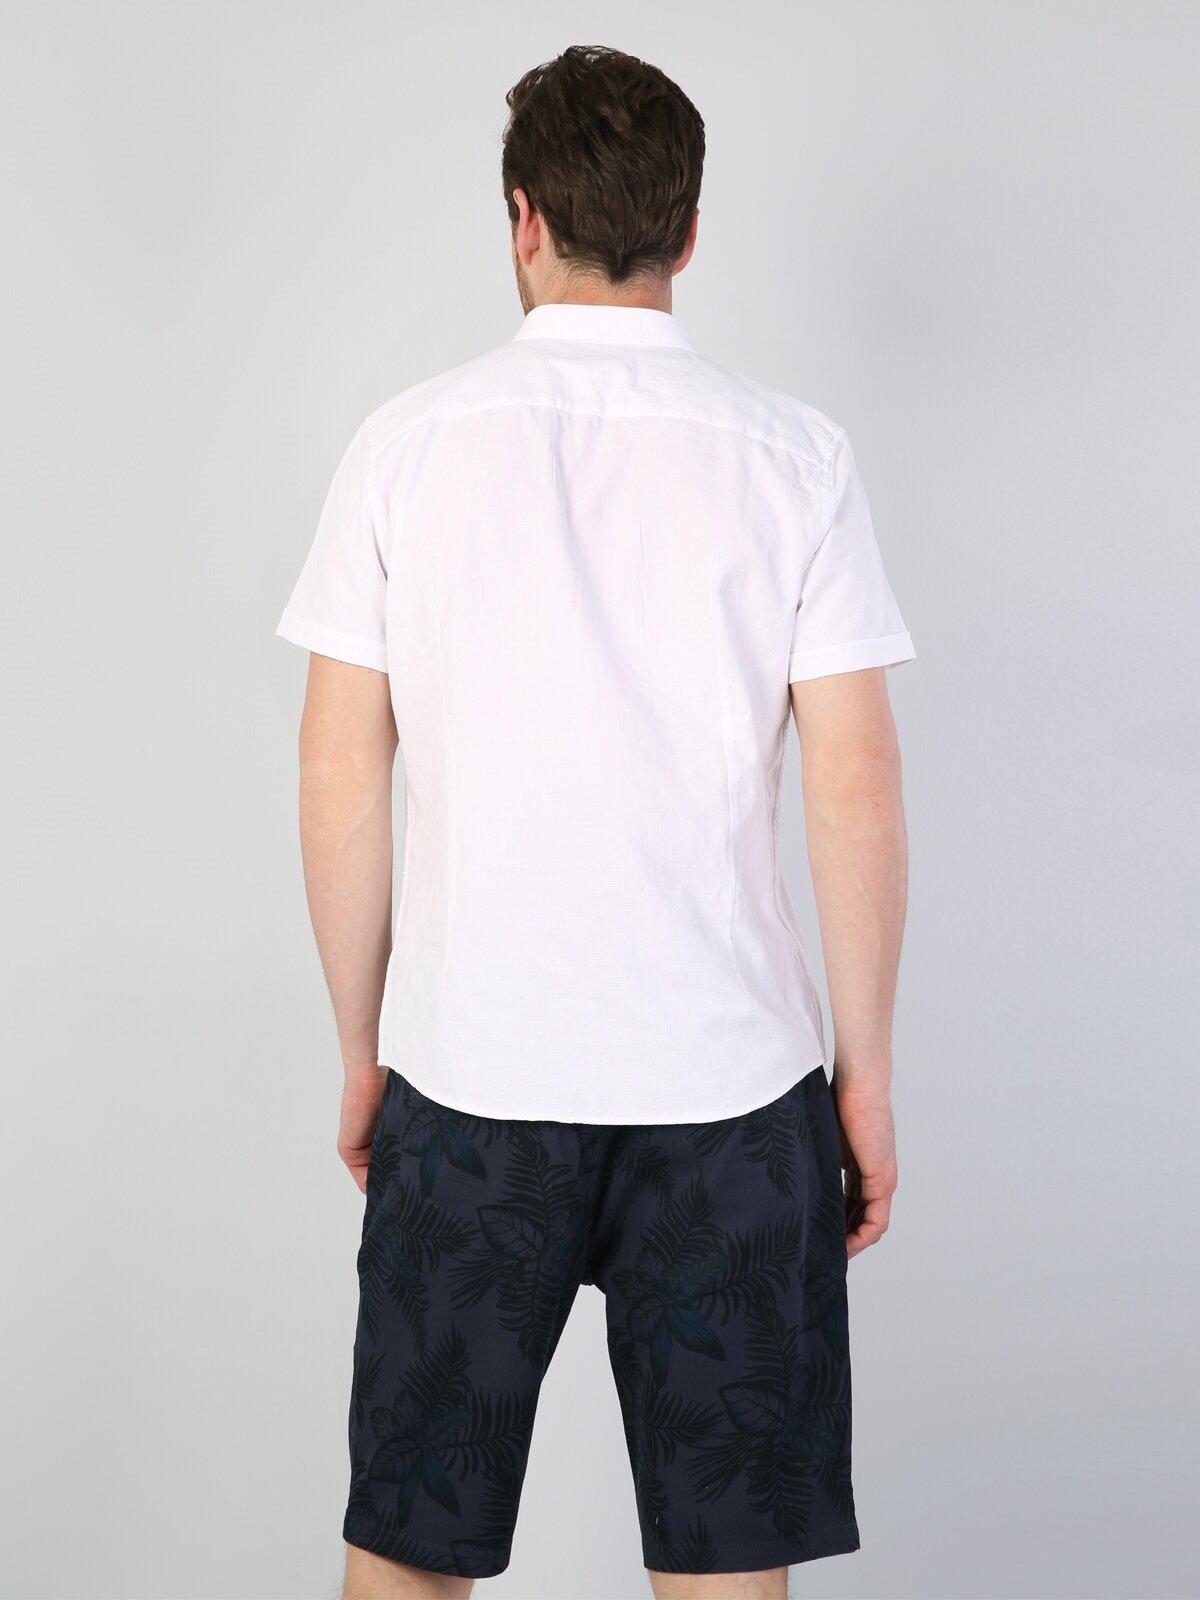 Slim Fit Beyaz Kısa Kol Gömlek